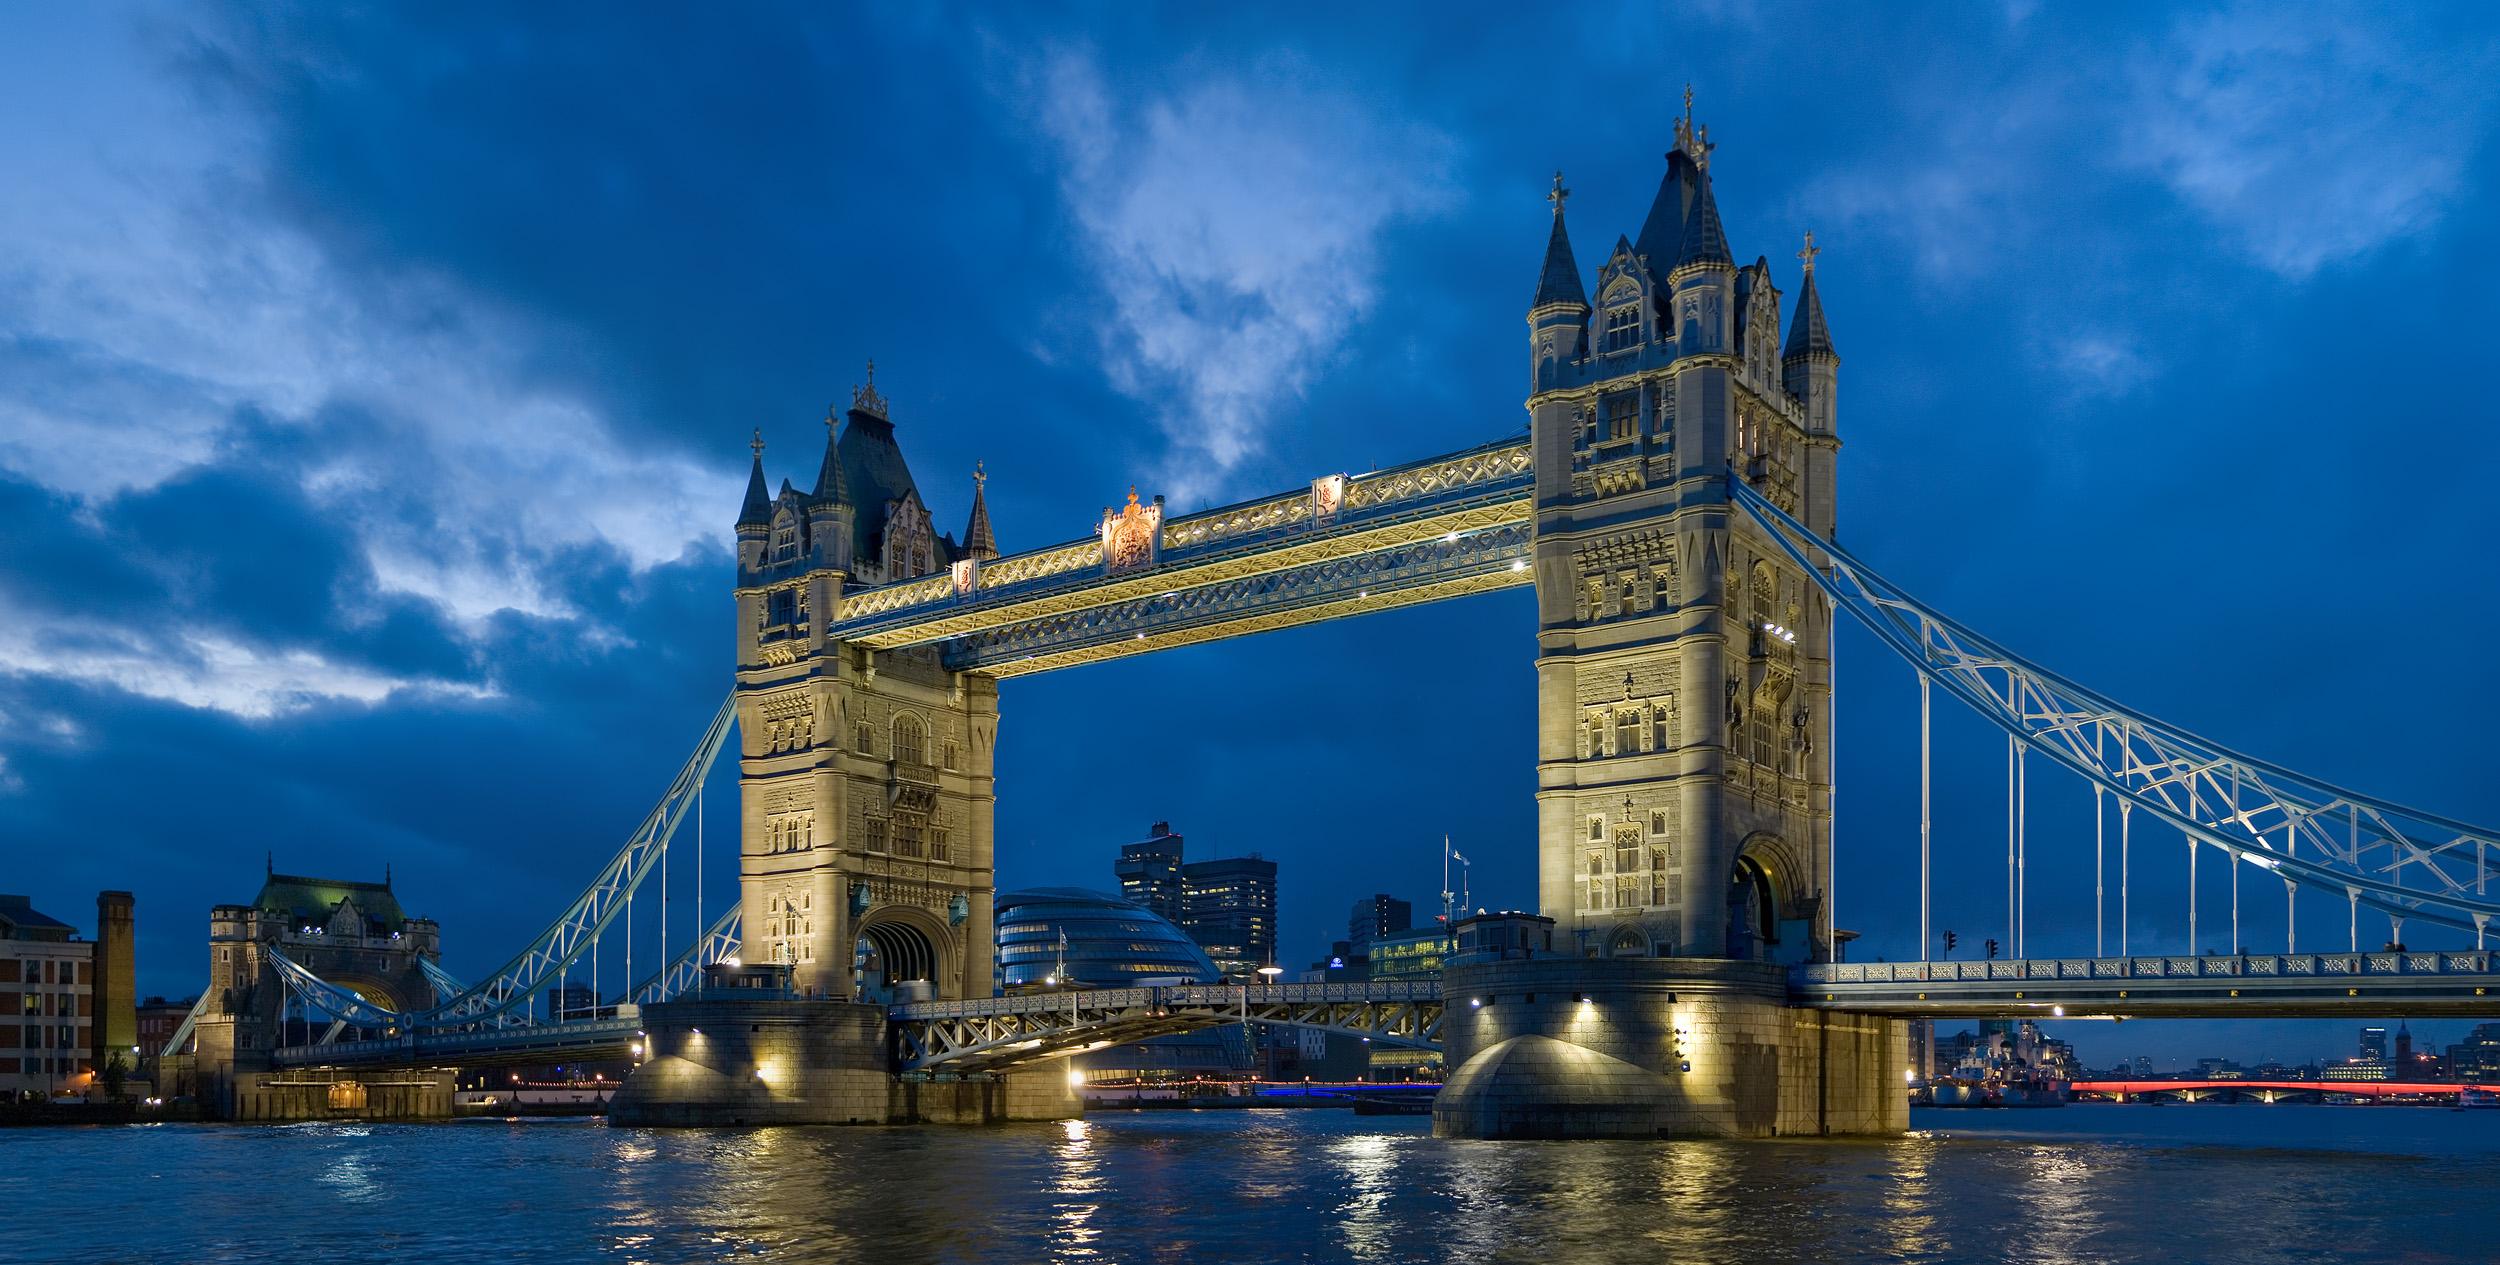 Tower-Bridge-London-Accesible